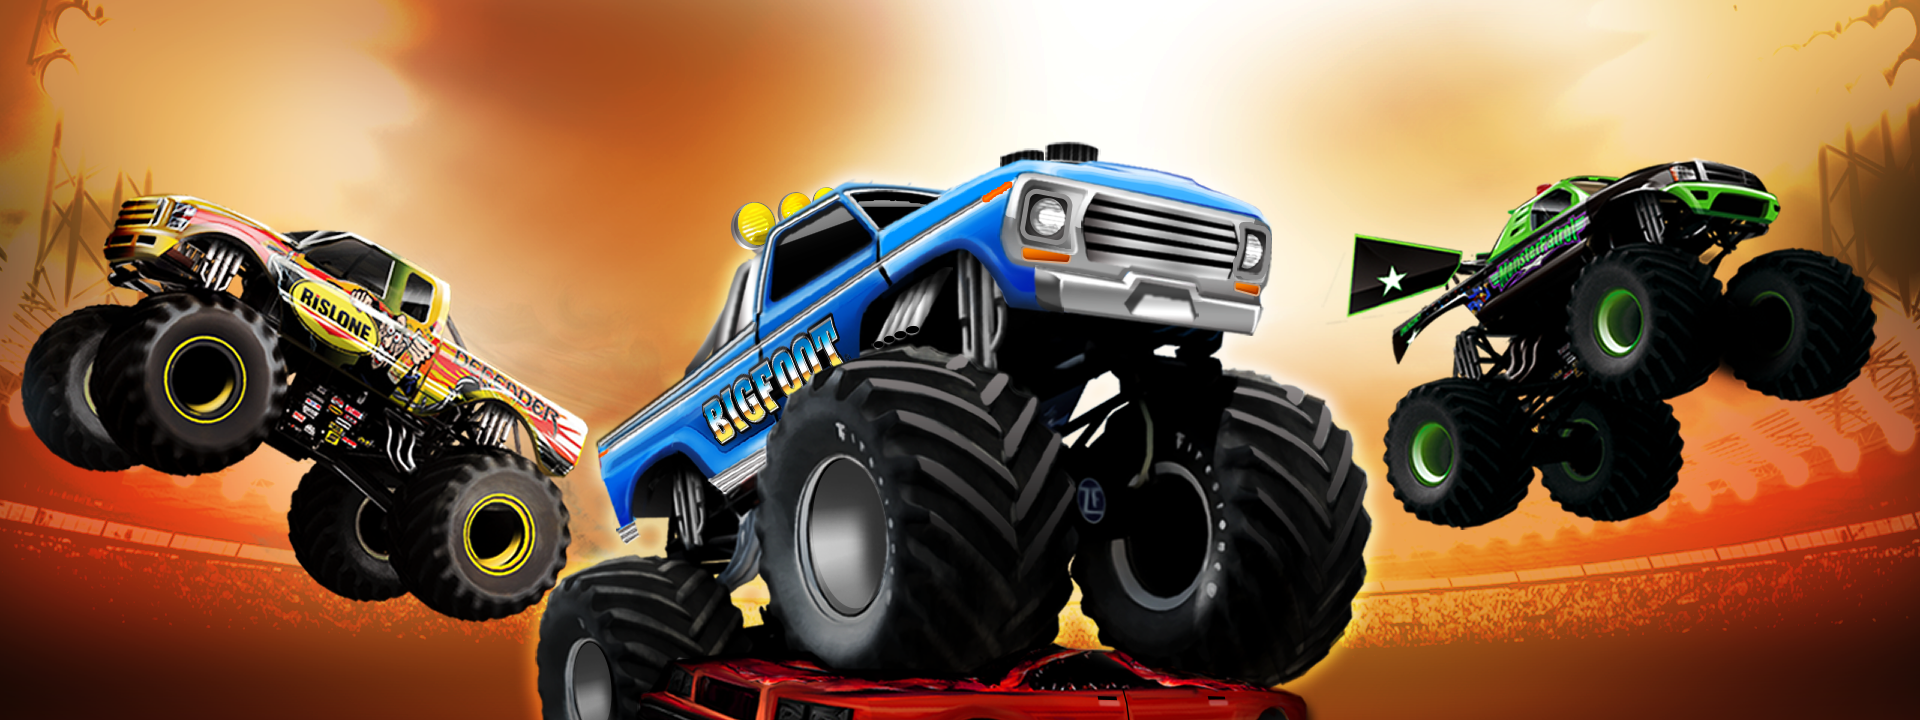 long island drag racing amazon store monster truck. Black Bedroom Furniture Sets. Home Design Ideas